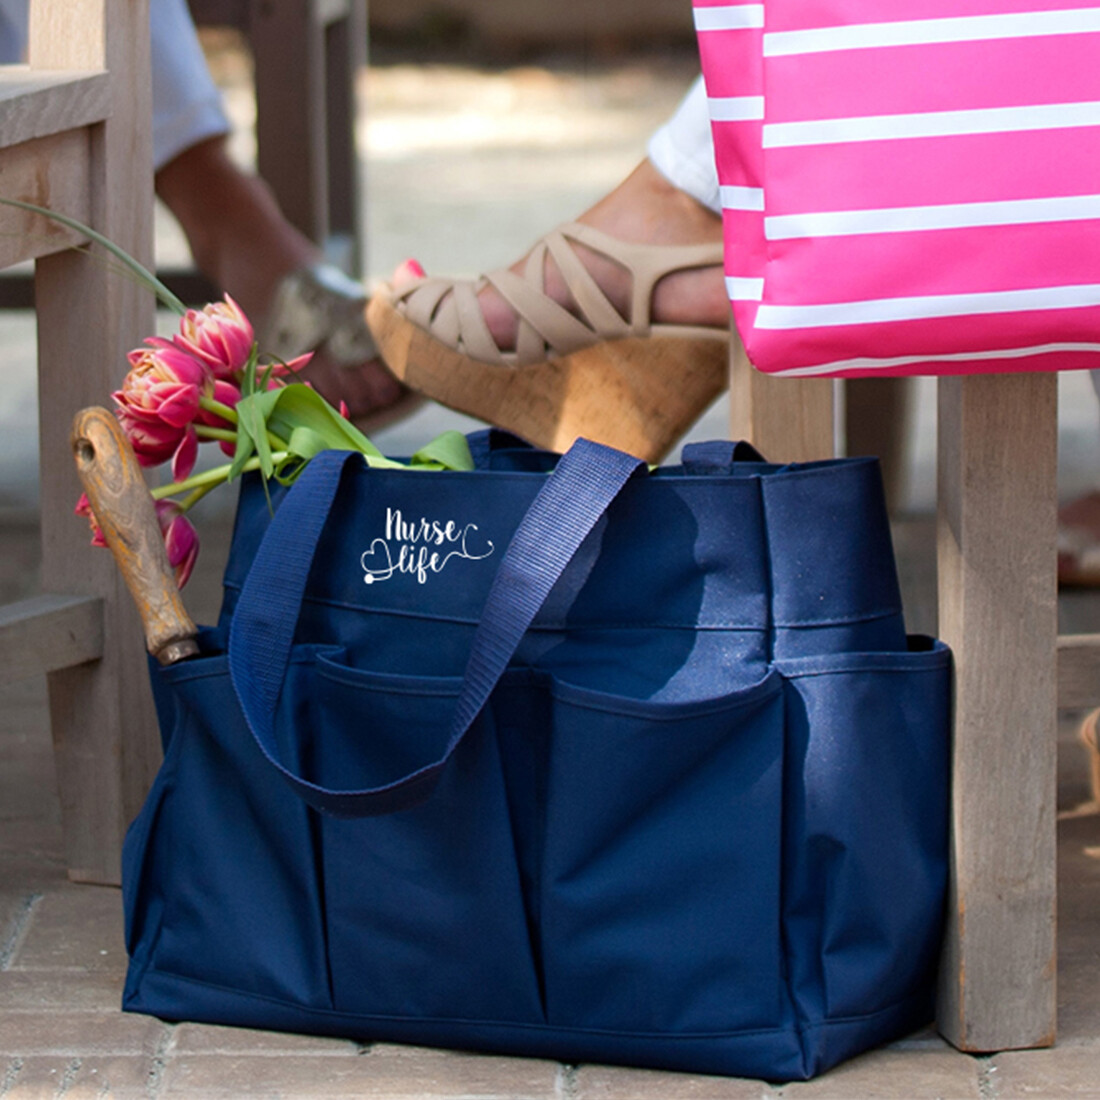 Nurse Life Navy Carry All Tote Bag